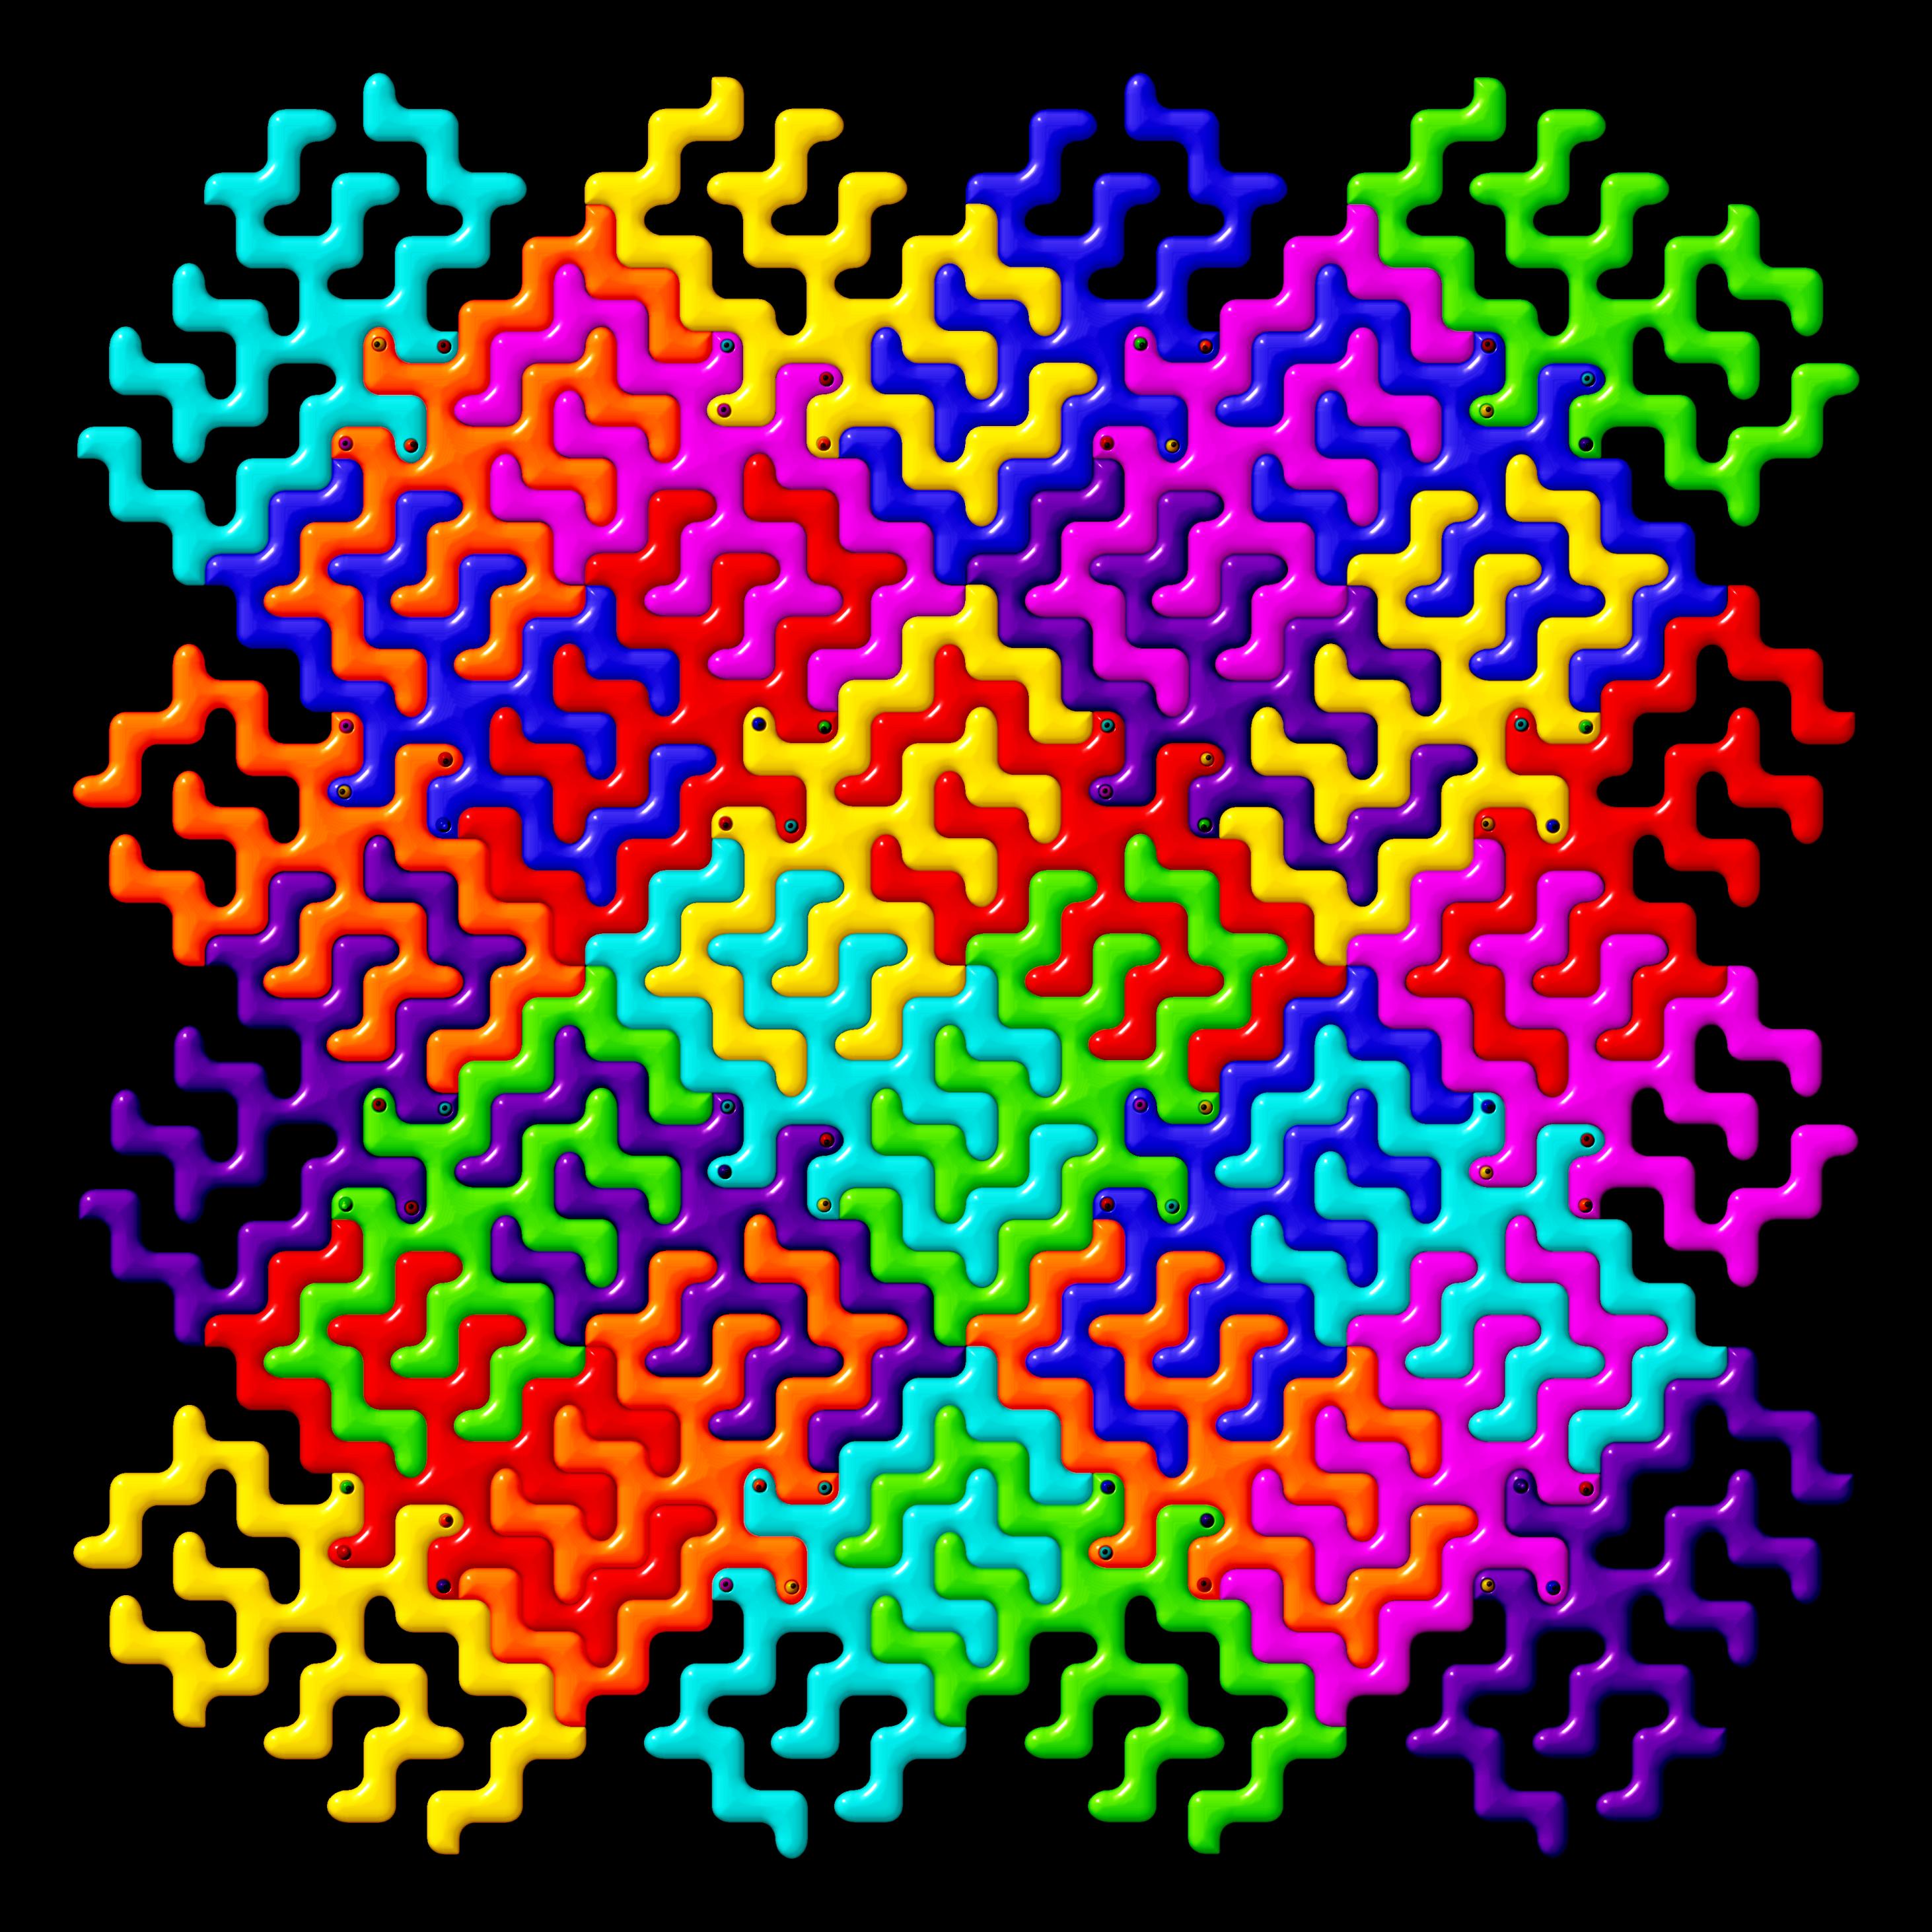 FSM tessellation « Church of the Flying Spaghetti Monster